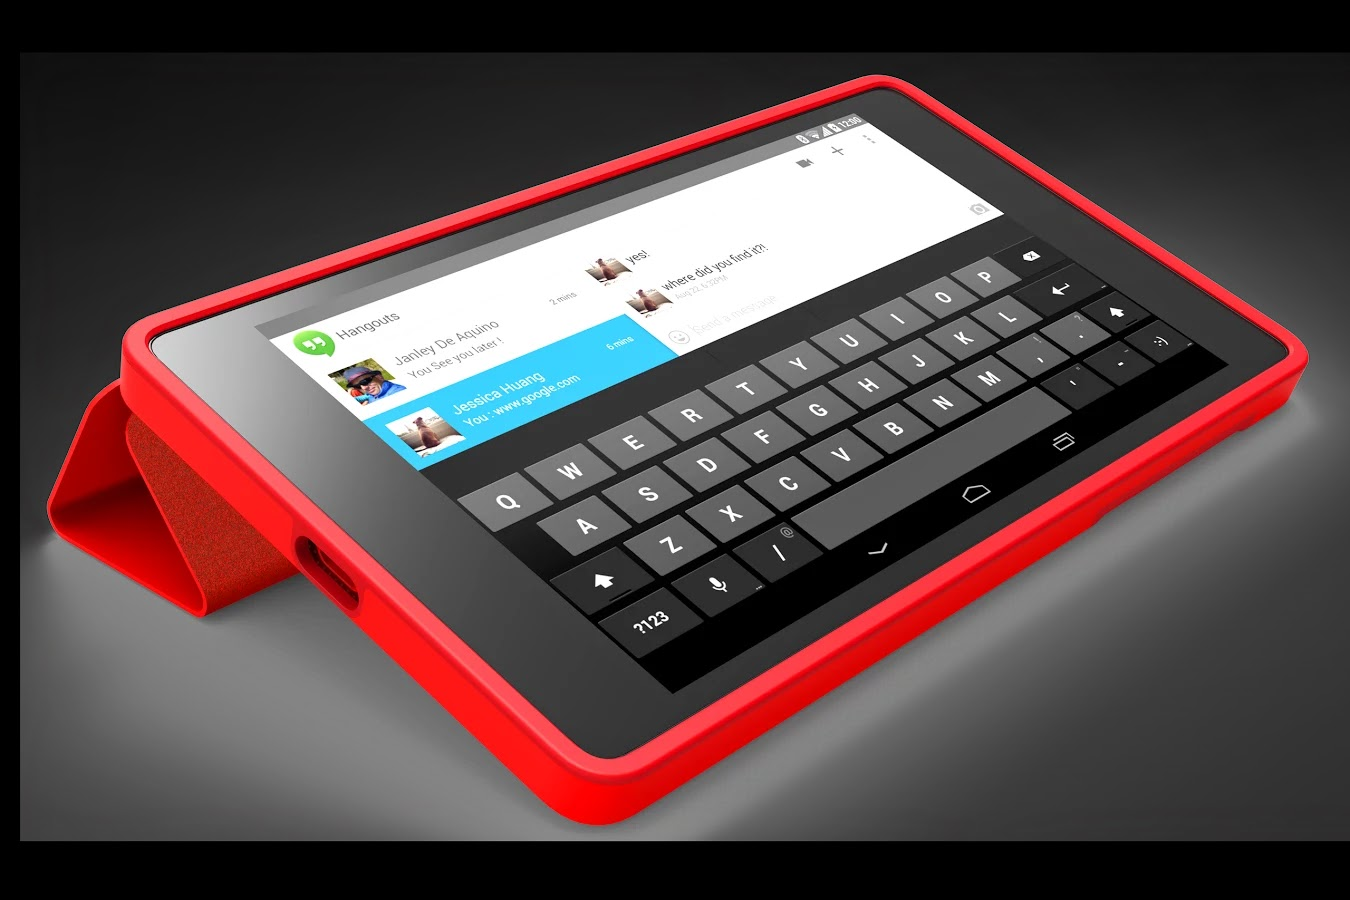 Nexus 7 Cases